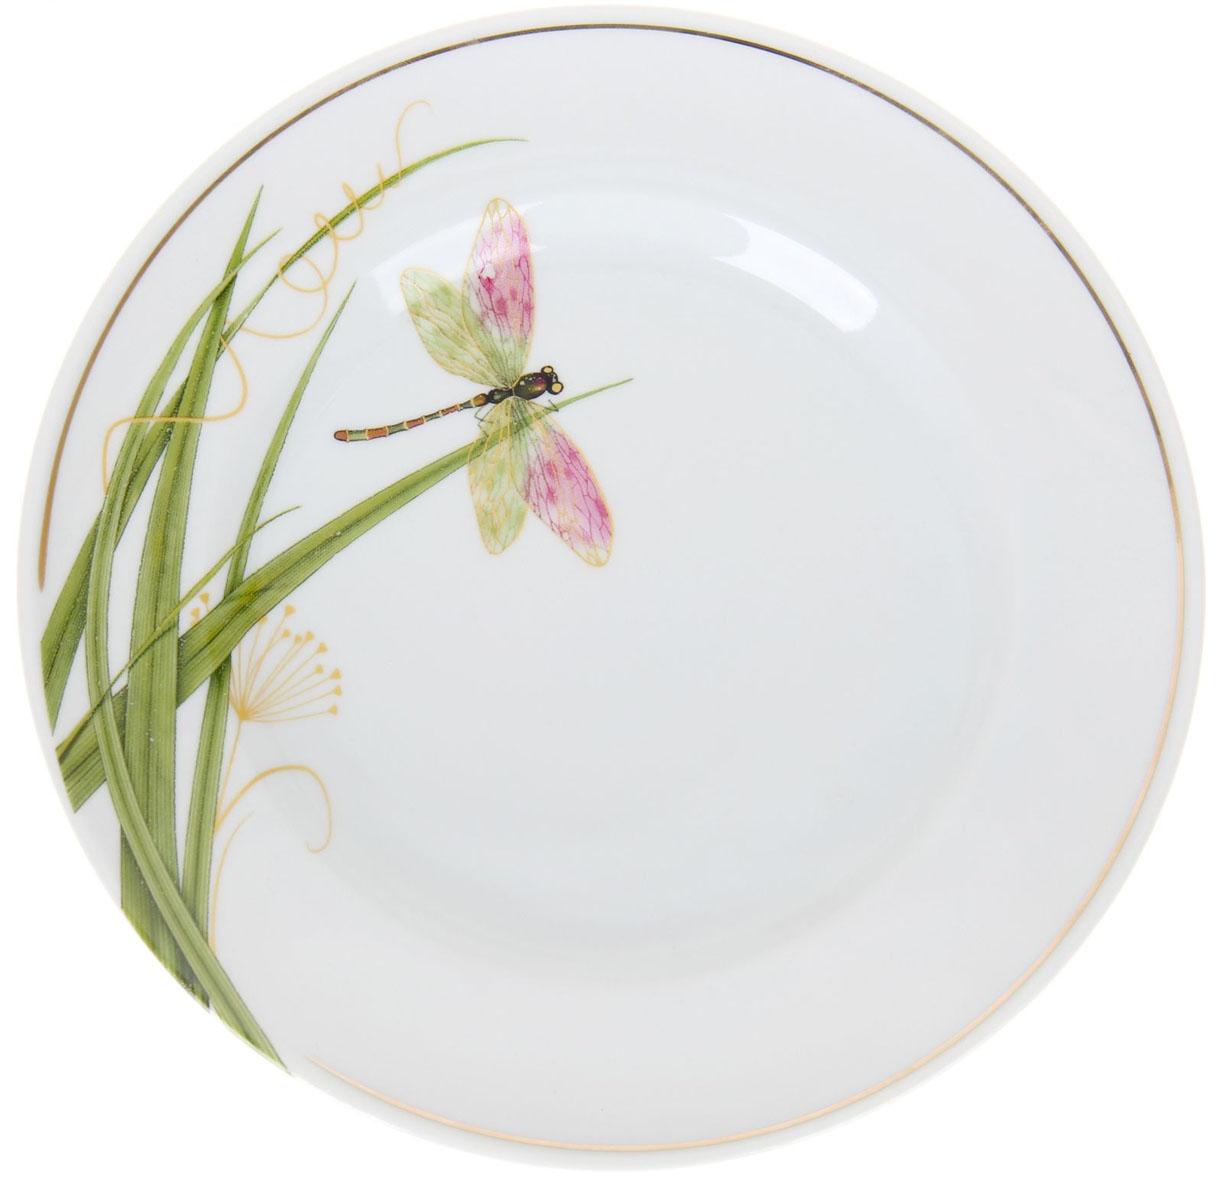 Тарелка мелкая Идиллия. Стрекоза, диаметр 20 см